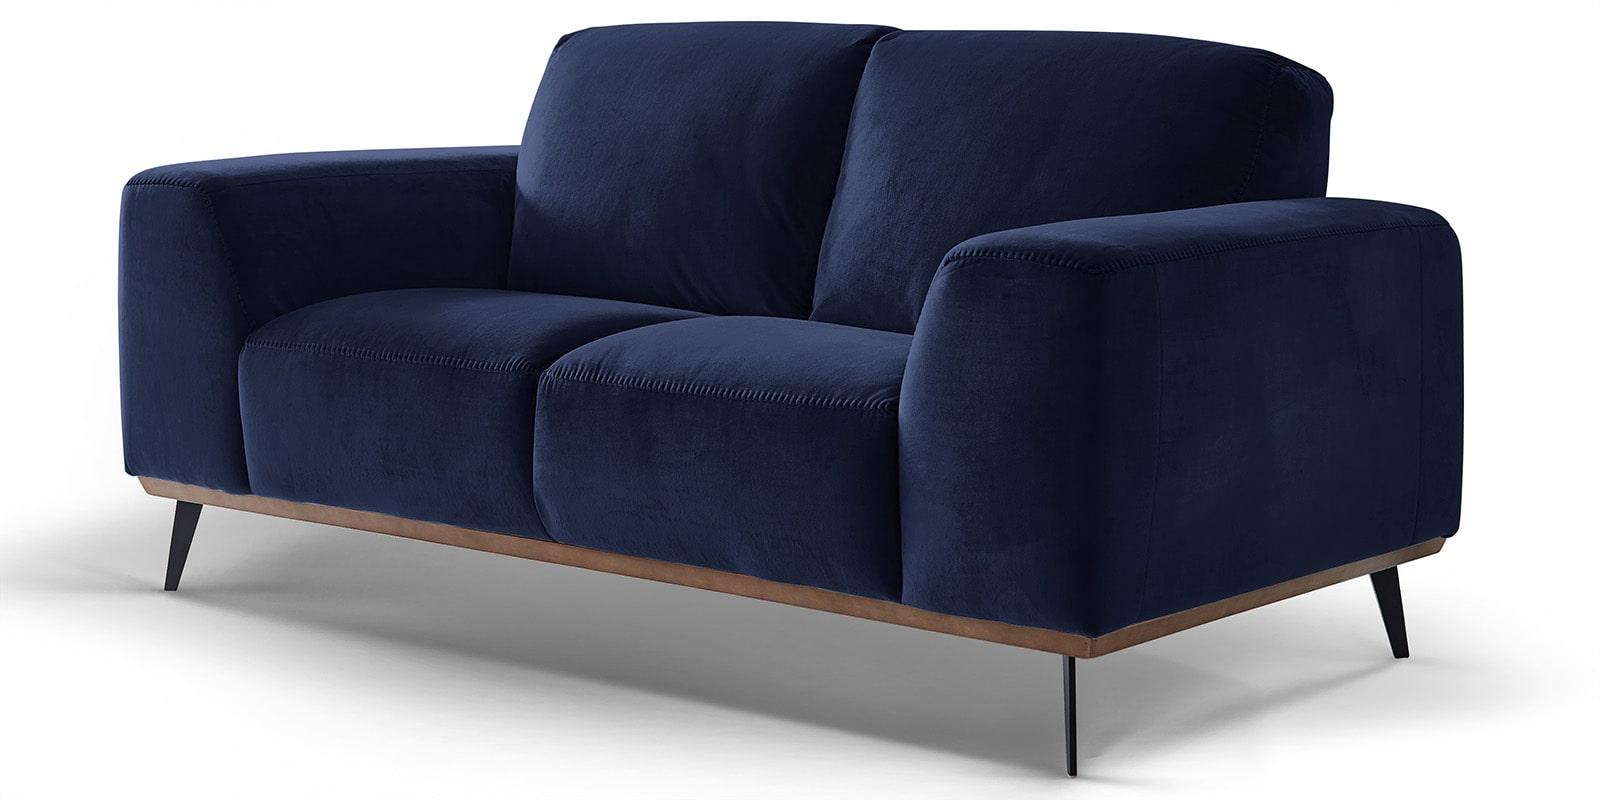 Moebella24 - 2-Sitzer - Sofa - Barcelona - Samt - Dunkelblau - Skandinavisches - Design - Punto - cavallo - Nähte - Detailaufnahme